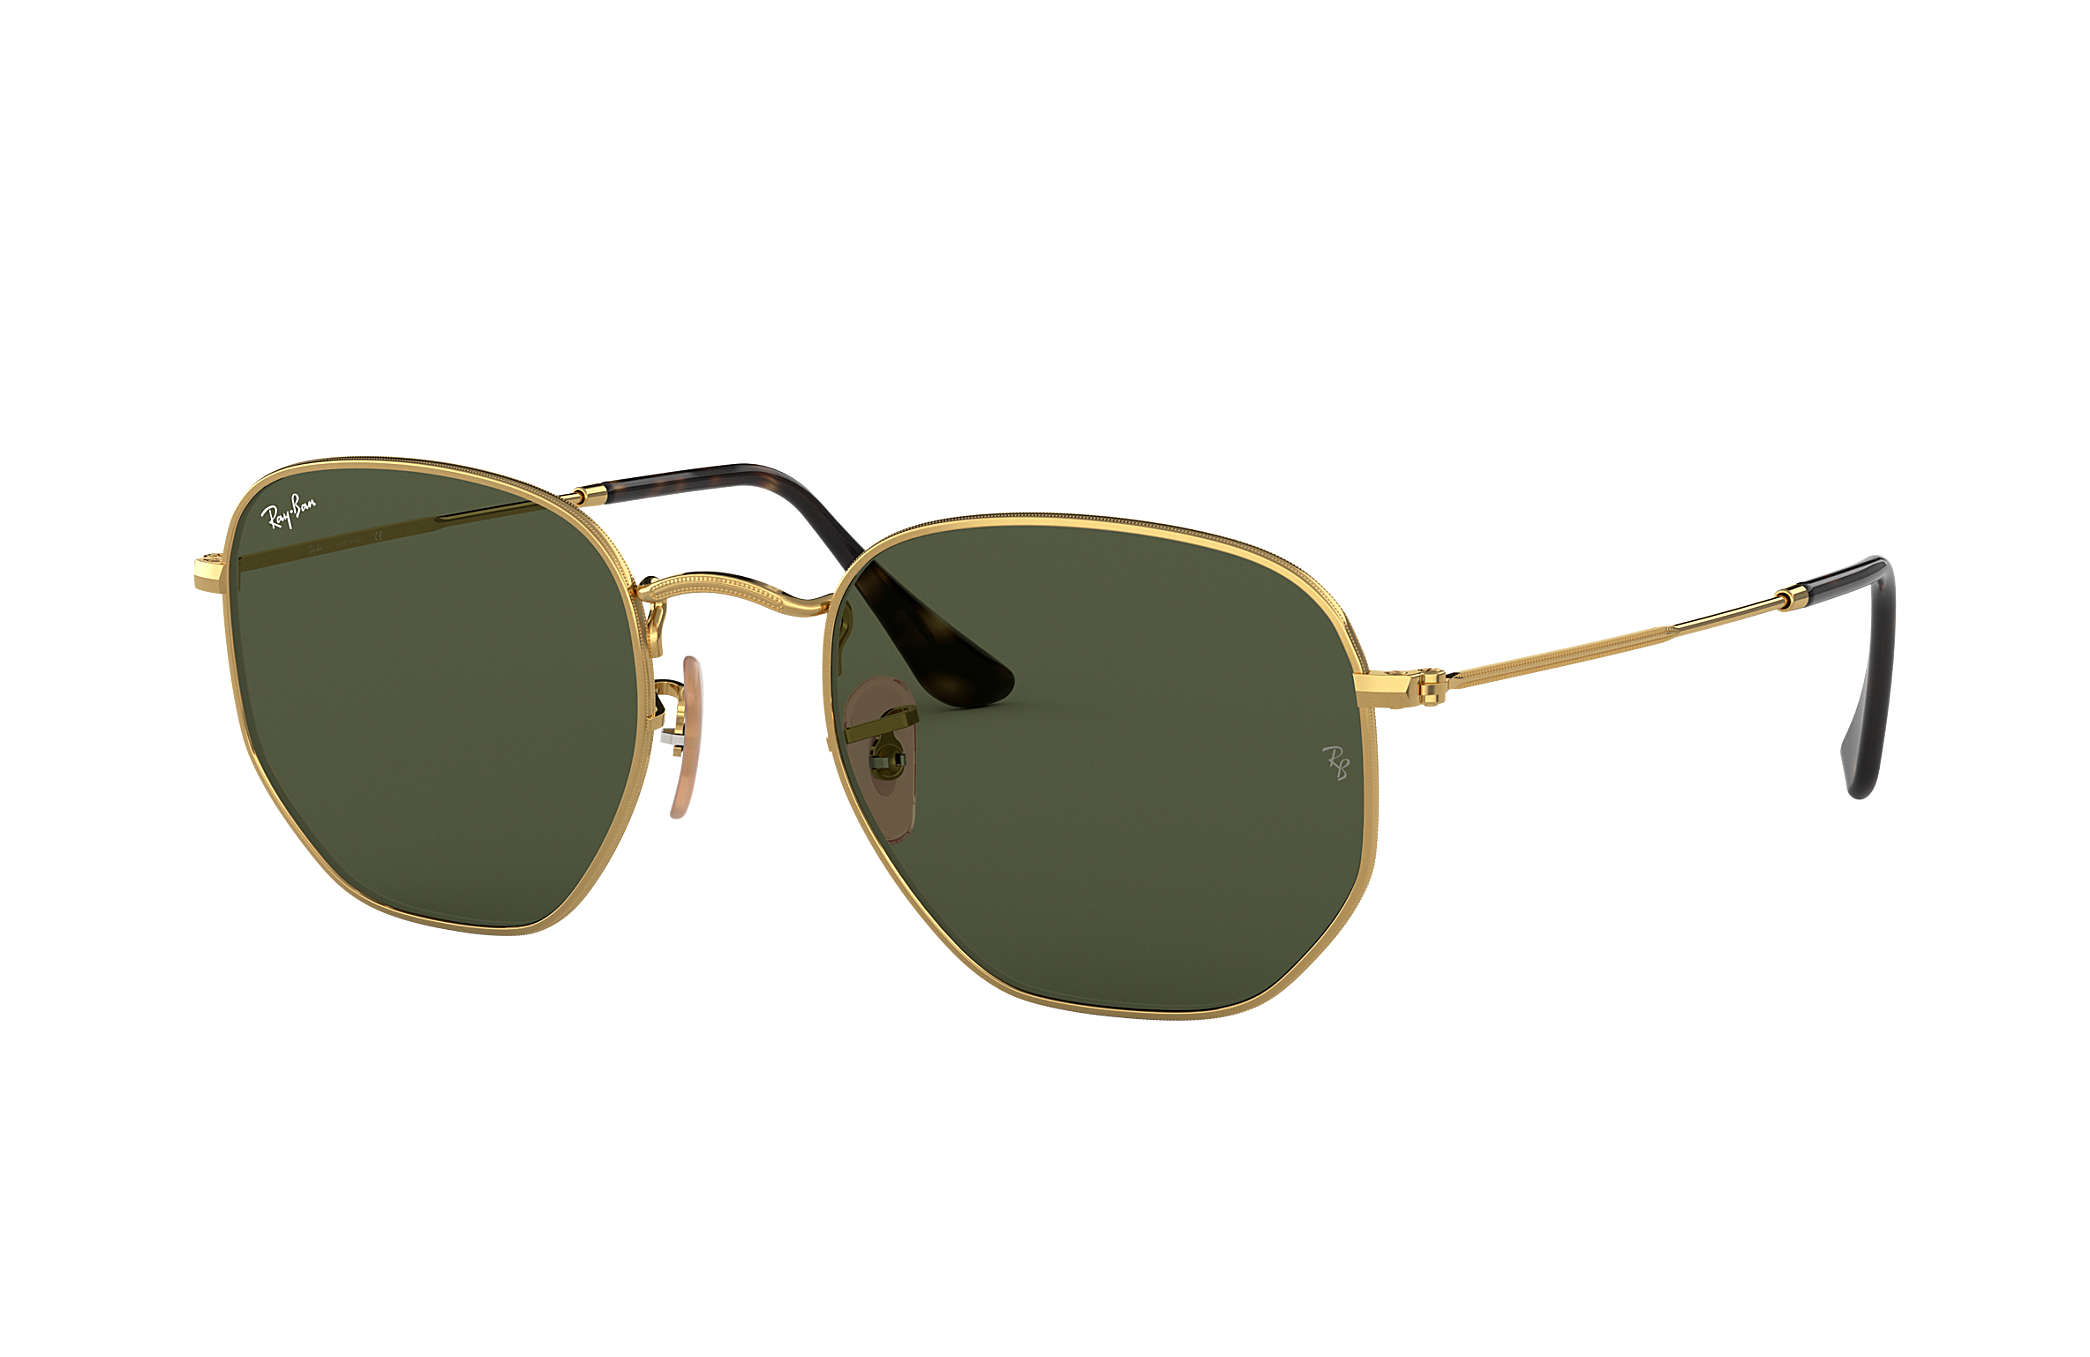 246ccd55dfac3 Ray-Ban Hexagonal Flat Lenses RB3548NL Ouro - Metal - Lentes Verde ...